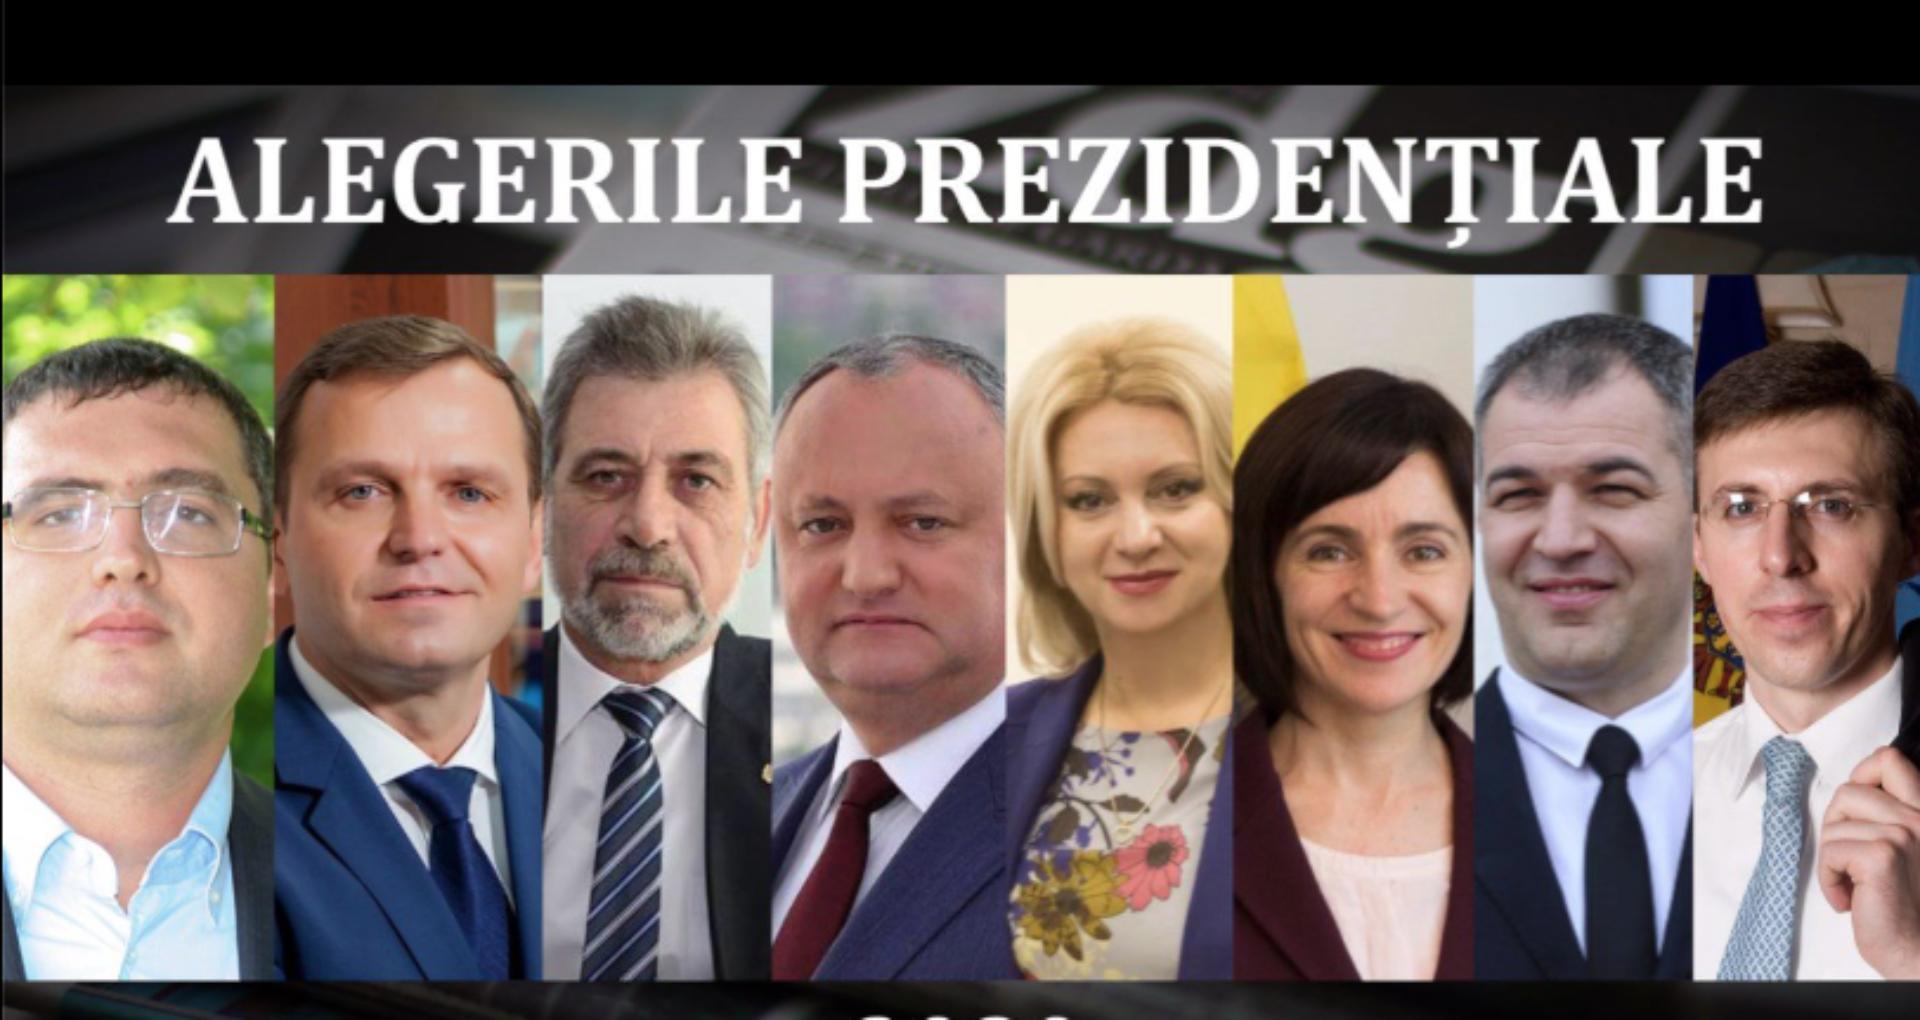 Rezultate exit-poll: Igor Dodon și Maia Sandu merg în turul II